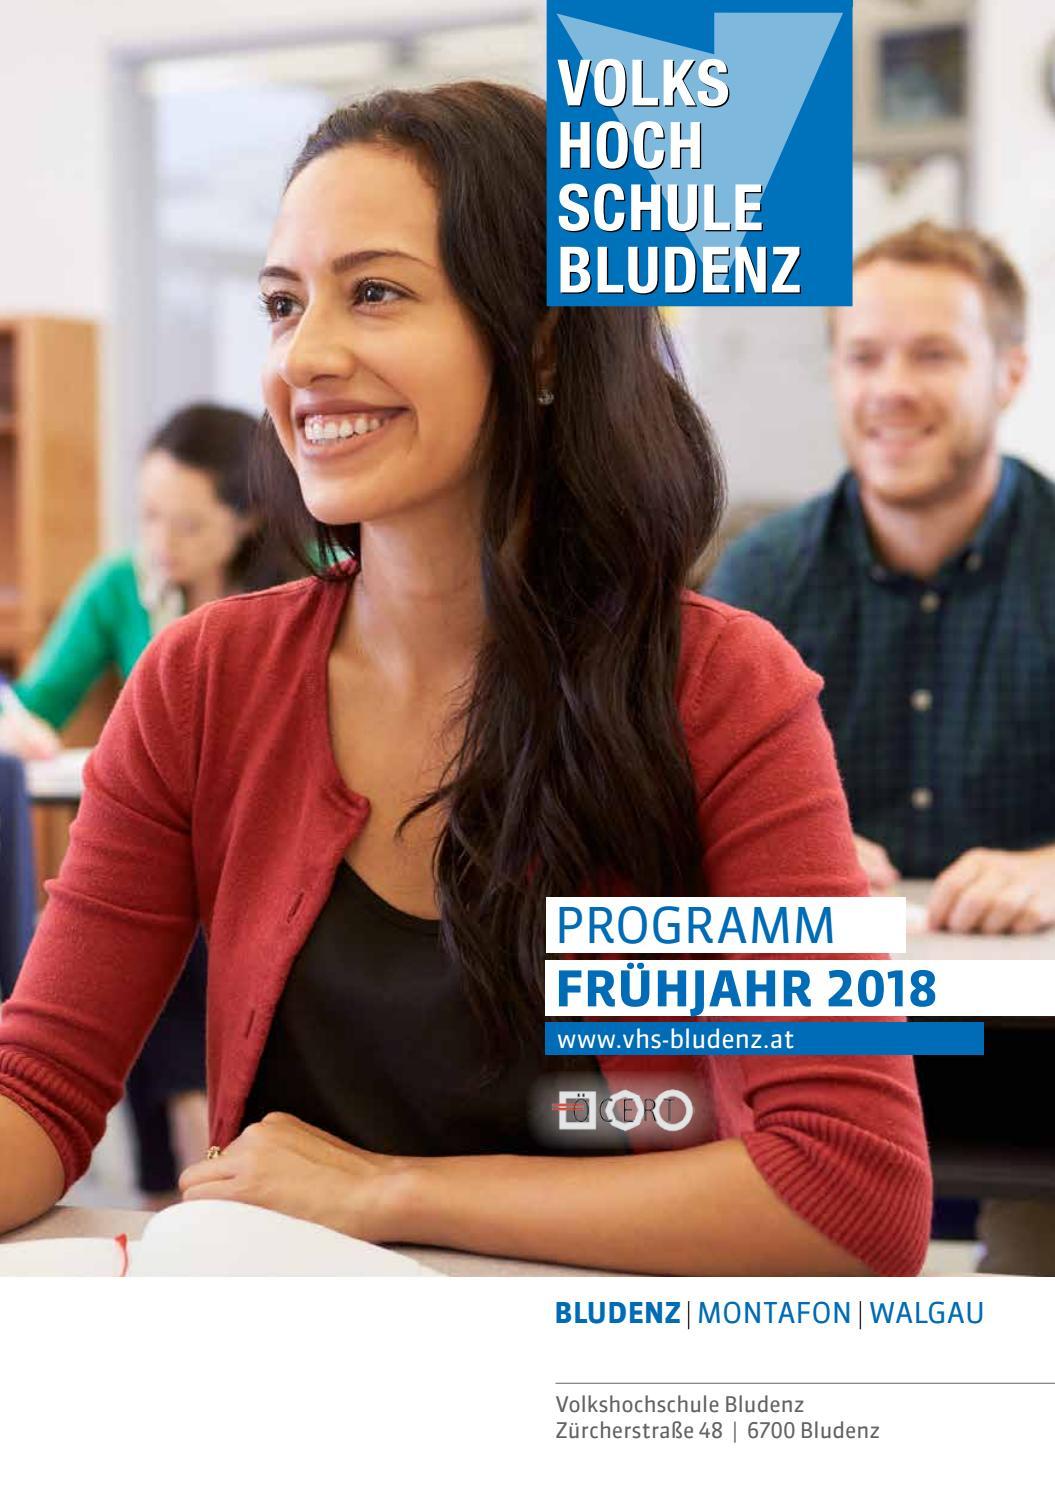 aktuell bludenz - Stadt Bludenz